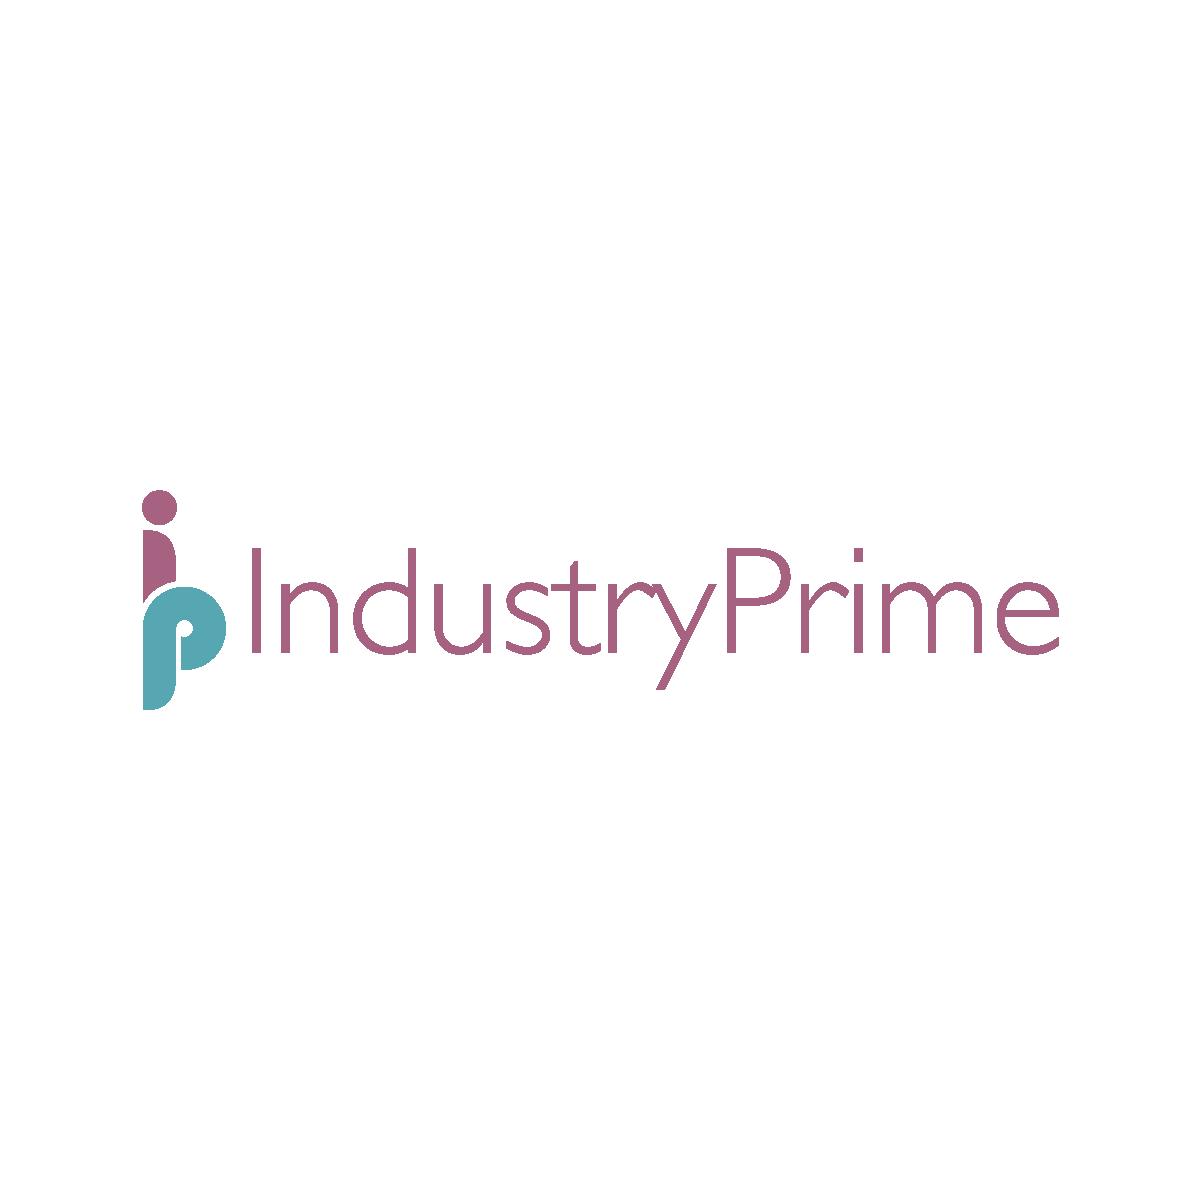 IndustryPrime logo